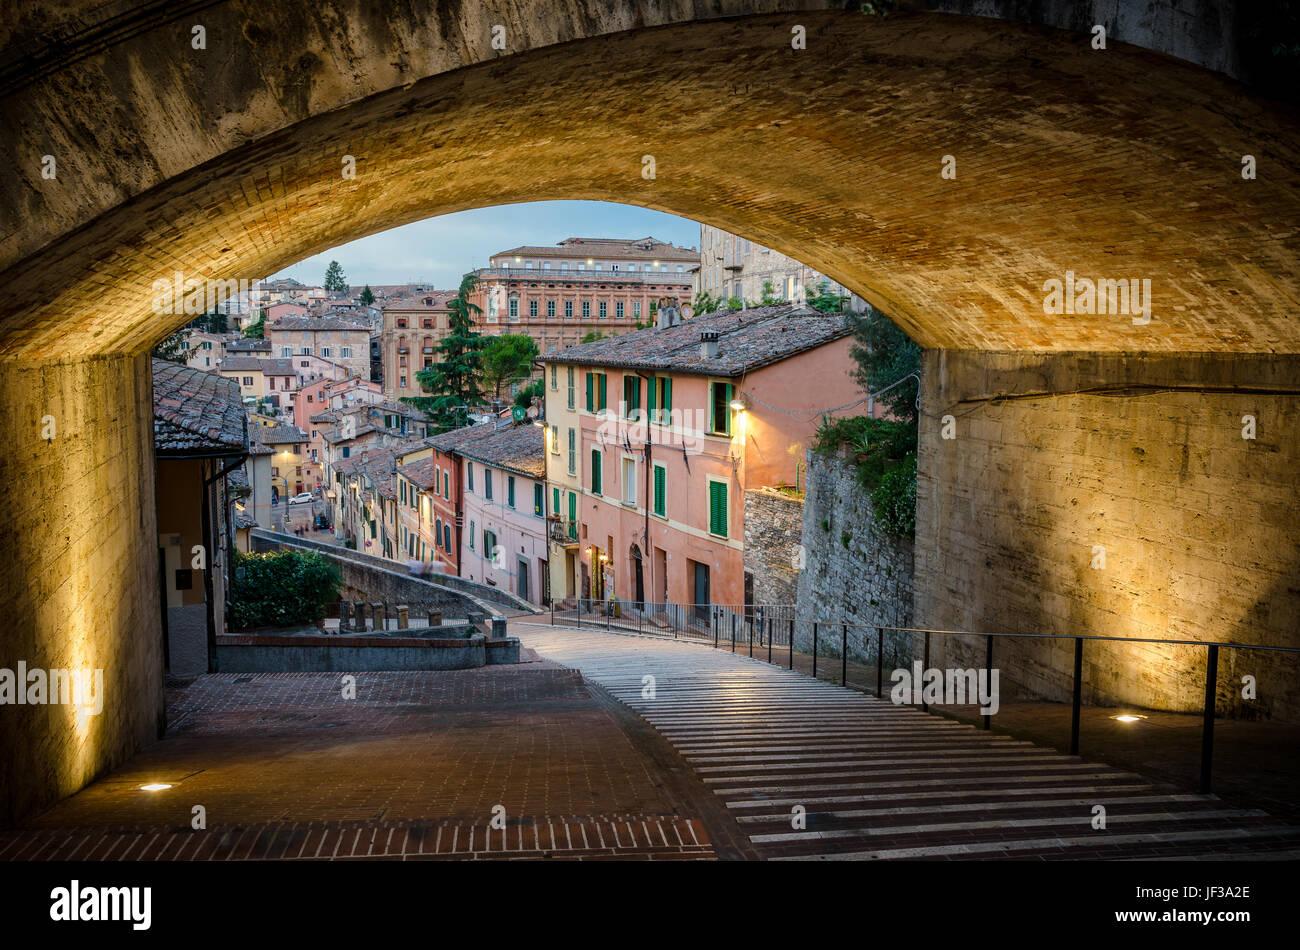 Perugia Via Appia Foto de stock